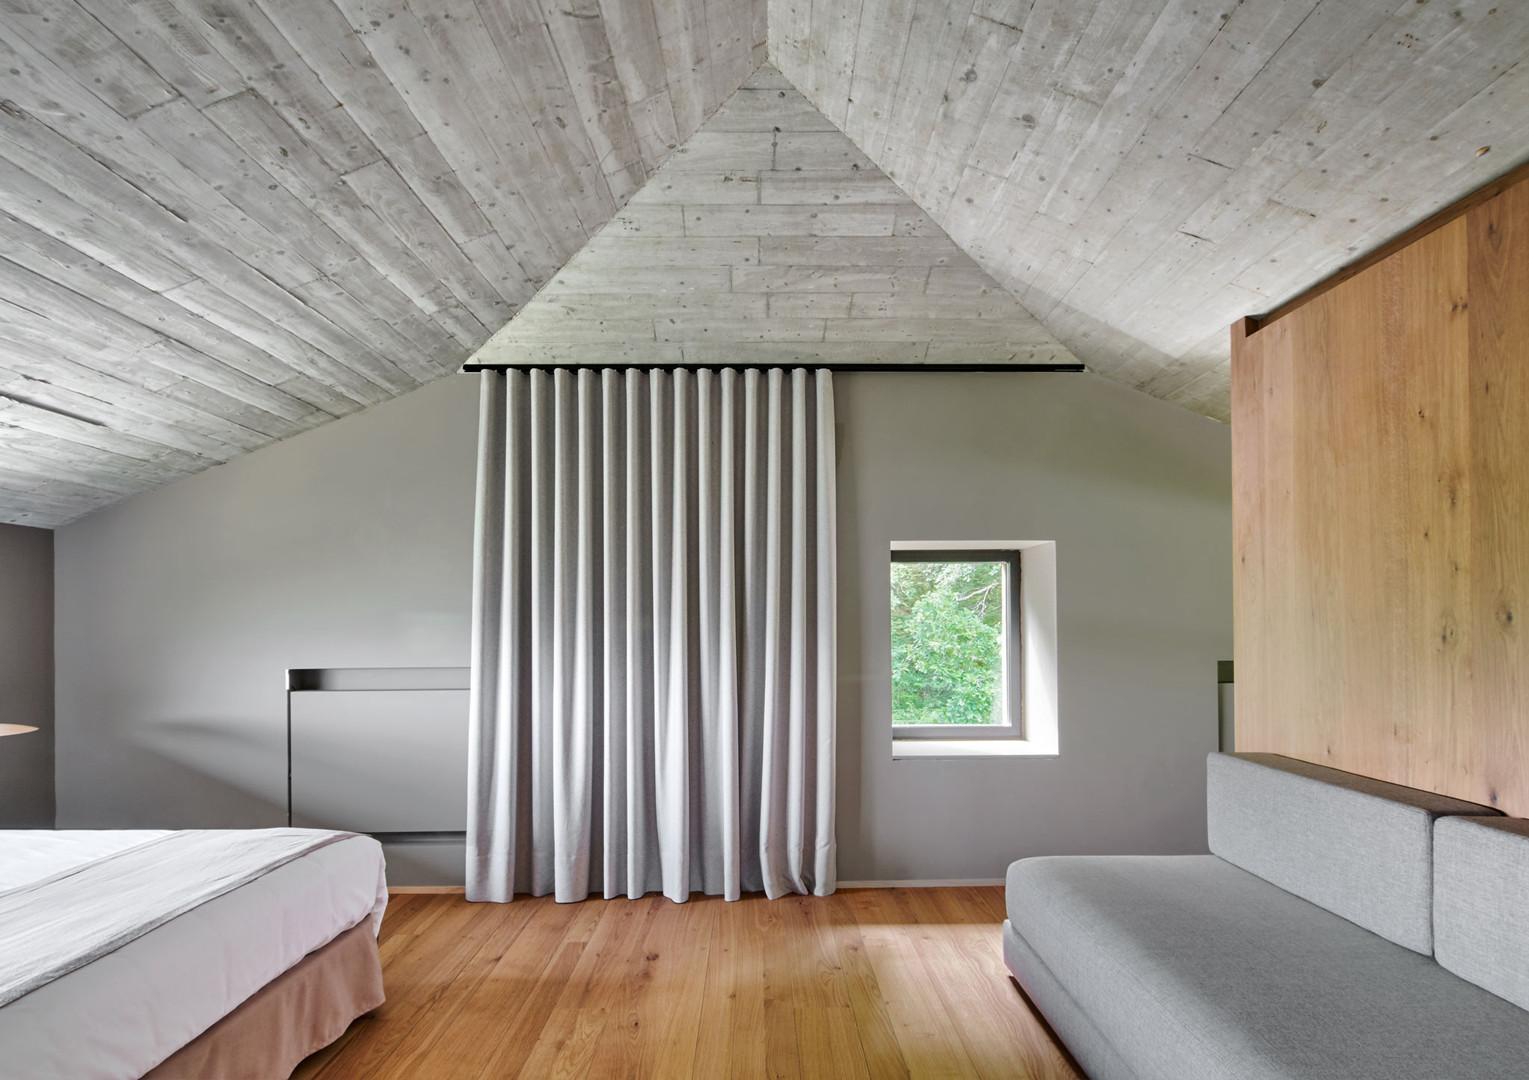 LandaburuBorda-House-JordiHidalgo-Bera-N